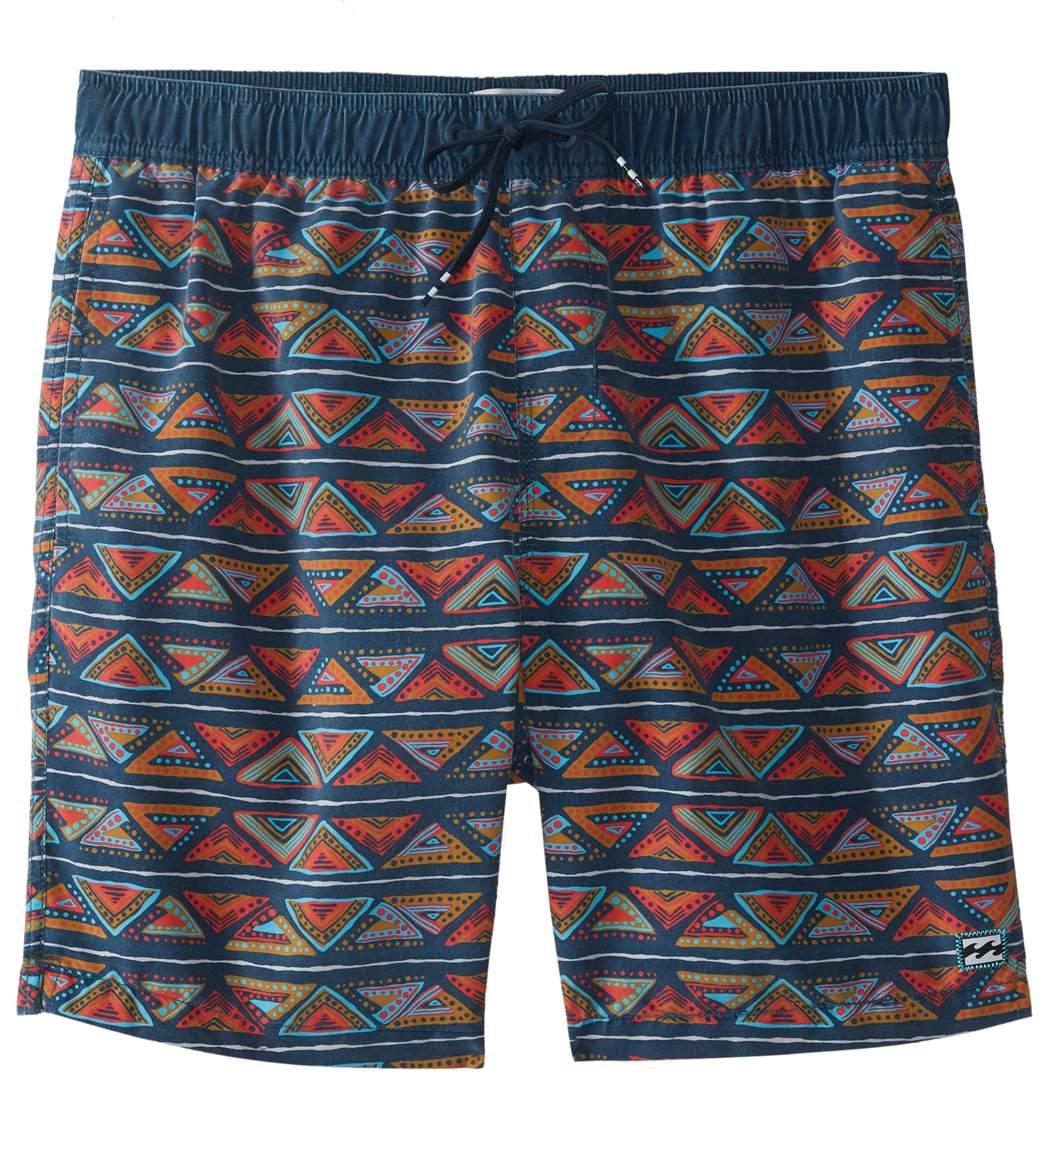 52e27241db Billabong Men's Sundays Layback Swim Trunk at SwimOutlet.com ...